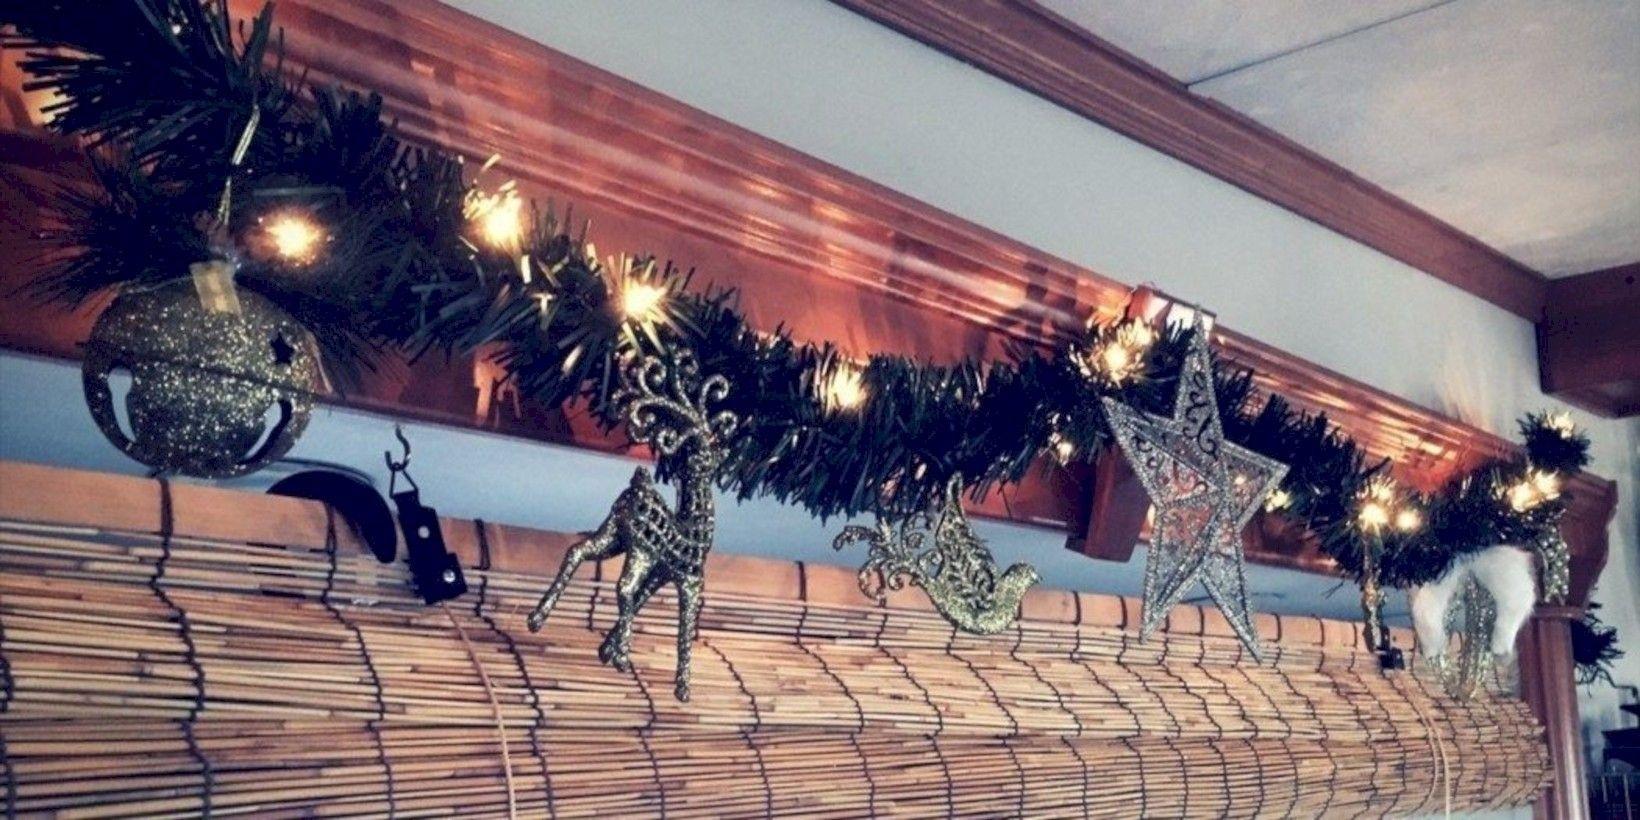 Splendid Christmas Rv Decorations Ideas For Valuable Moment22